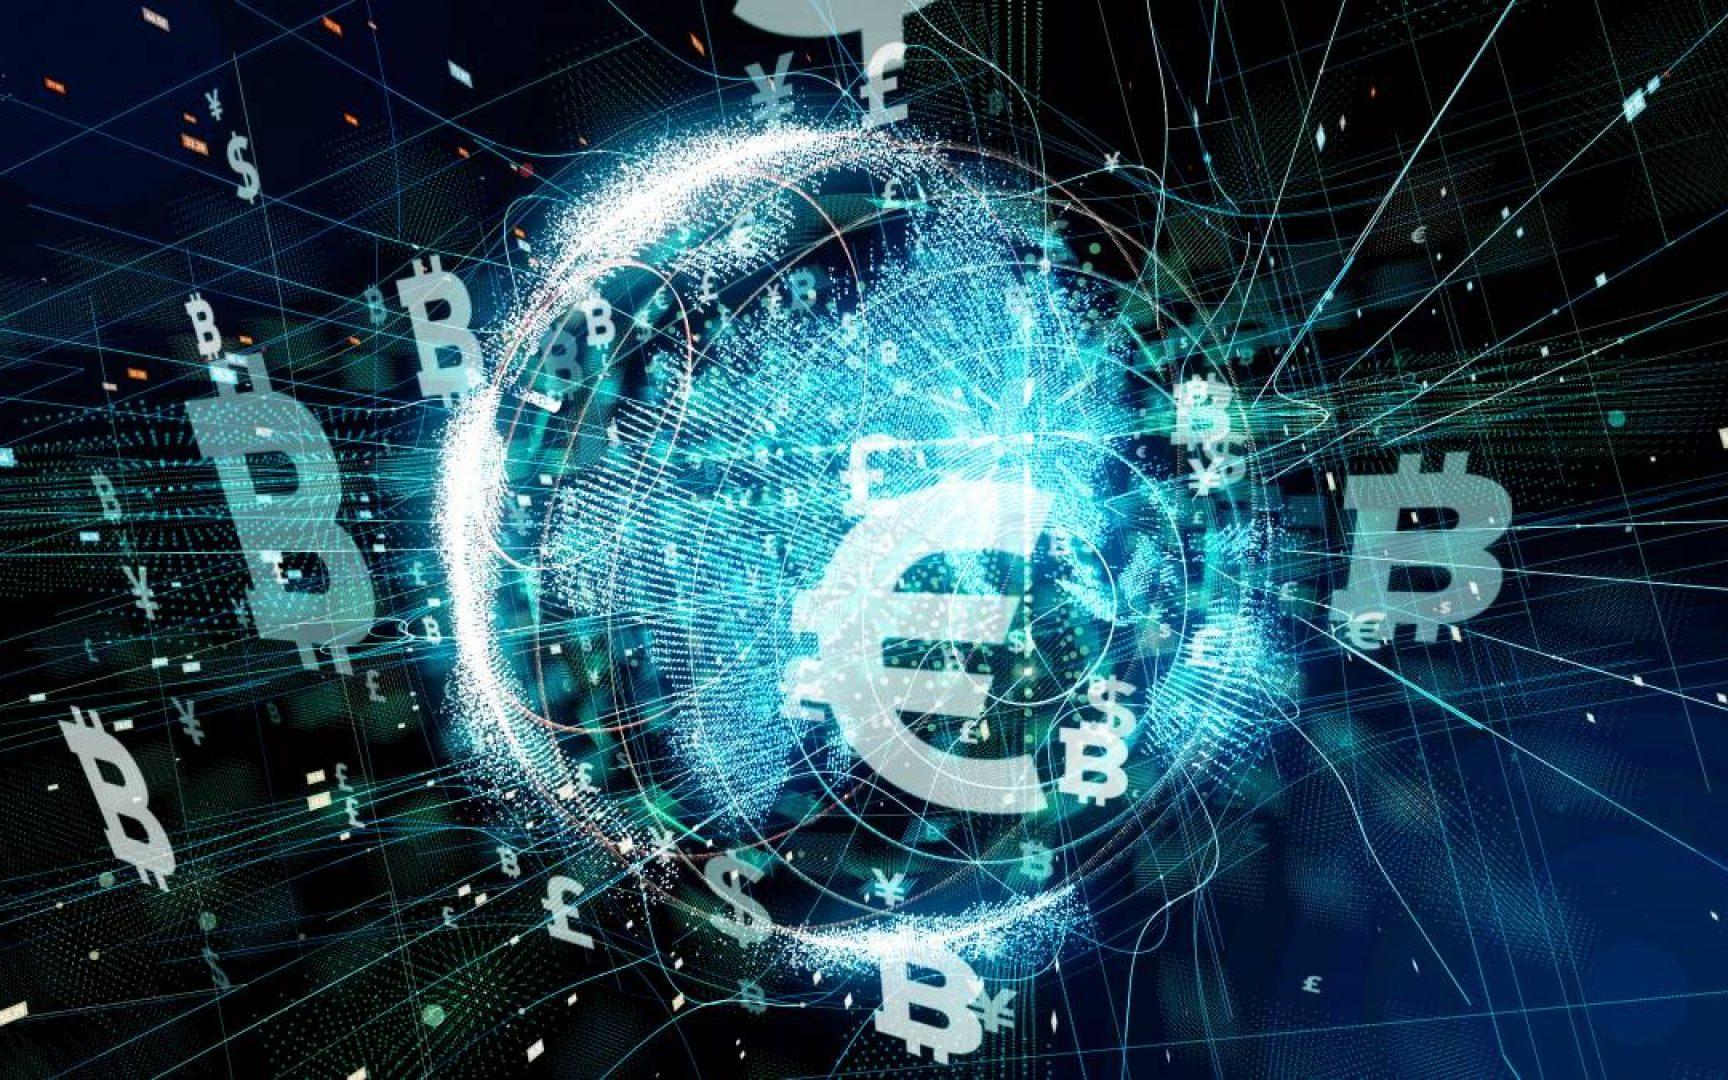 Bitcoin symbols float around a circle